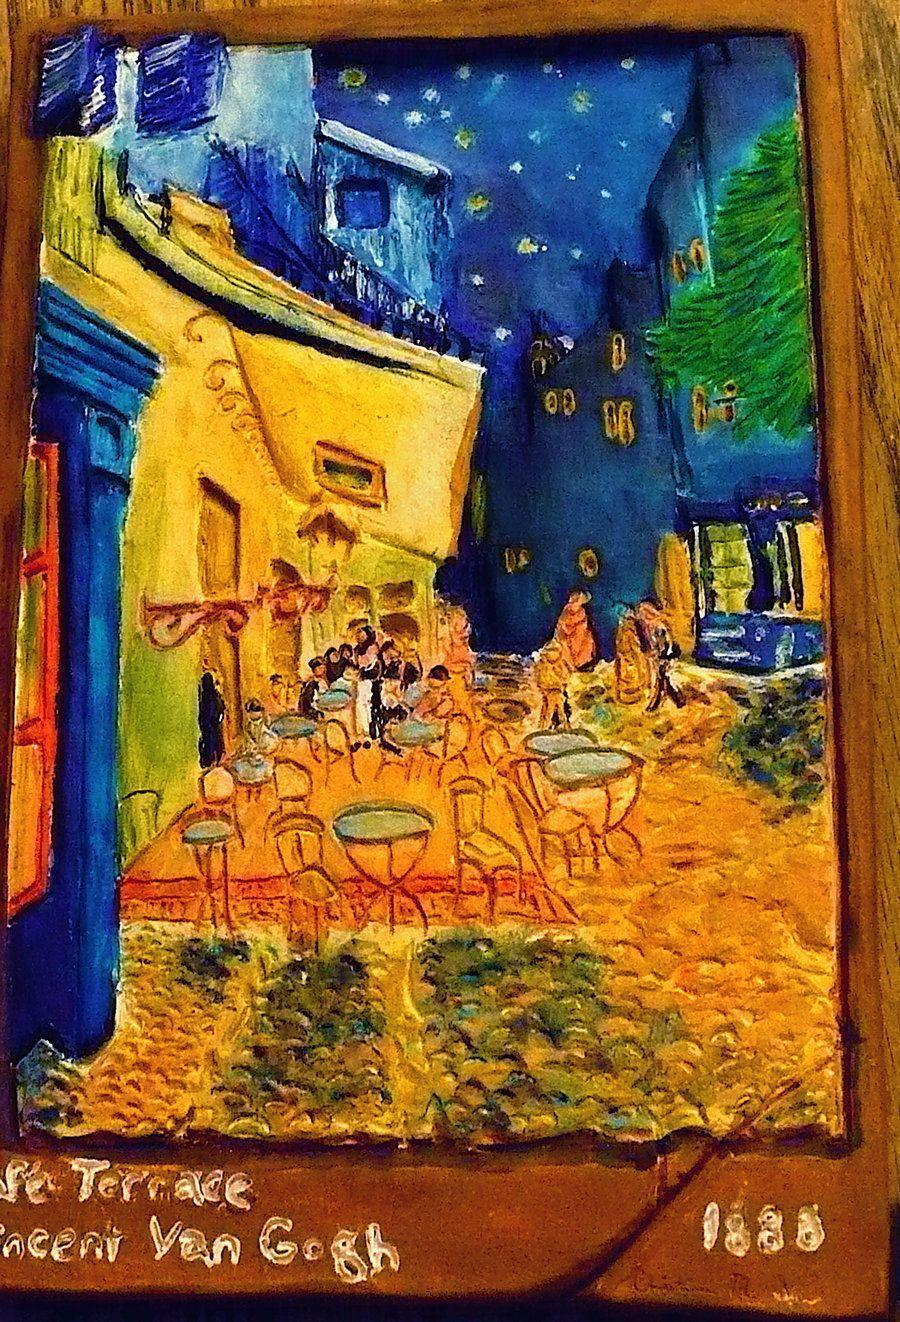 Van Gogh Caf 233 Terrace At Night Wallpapers Wallpaper Cave